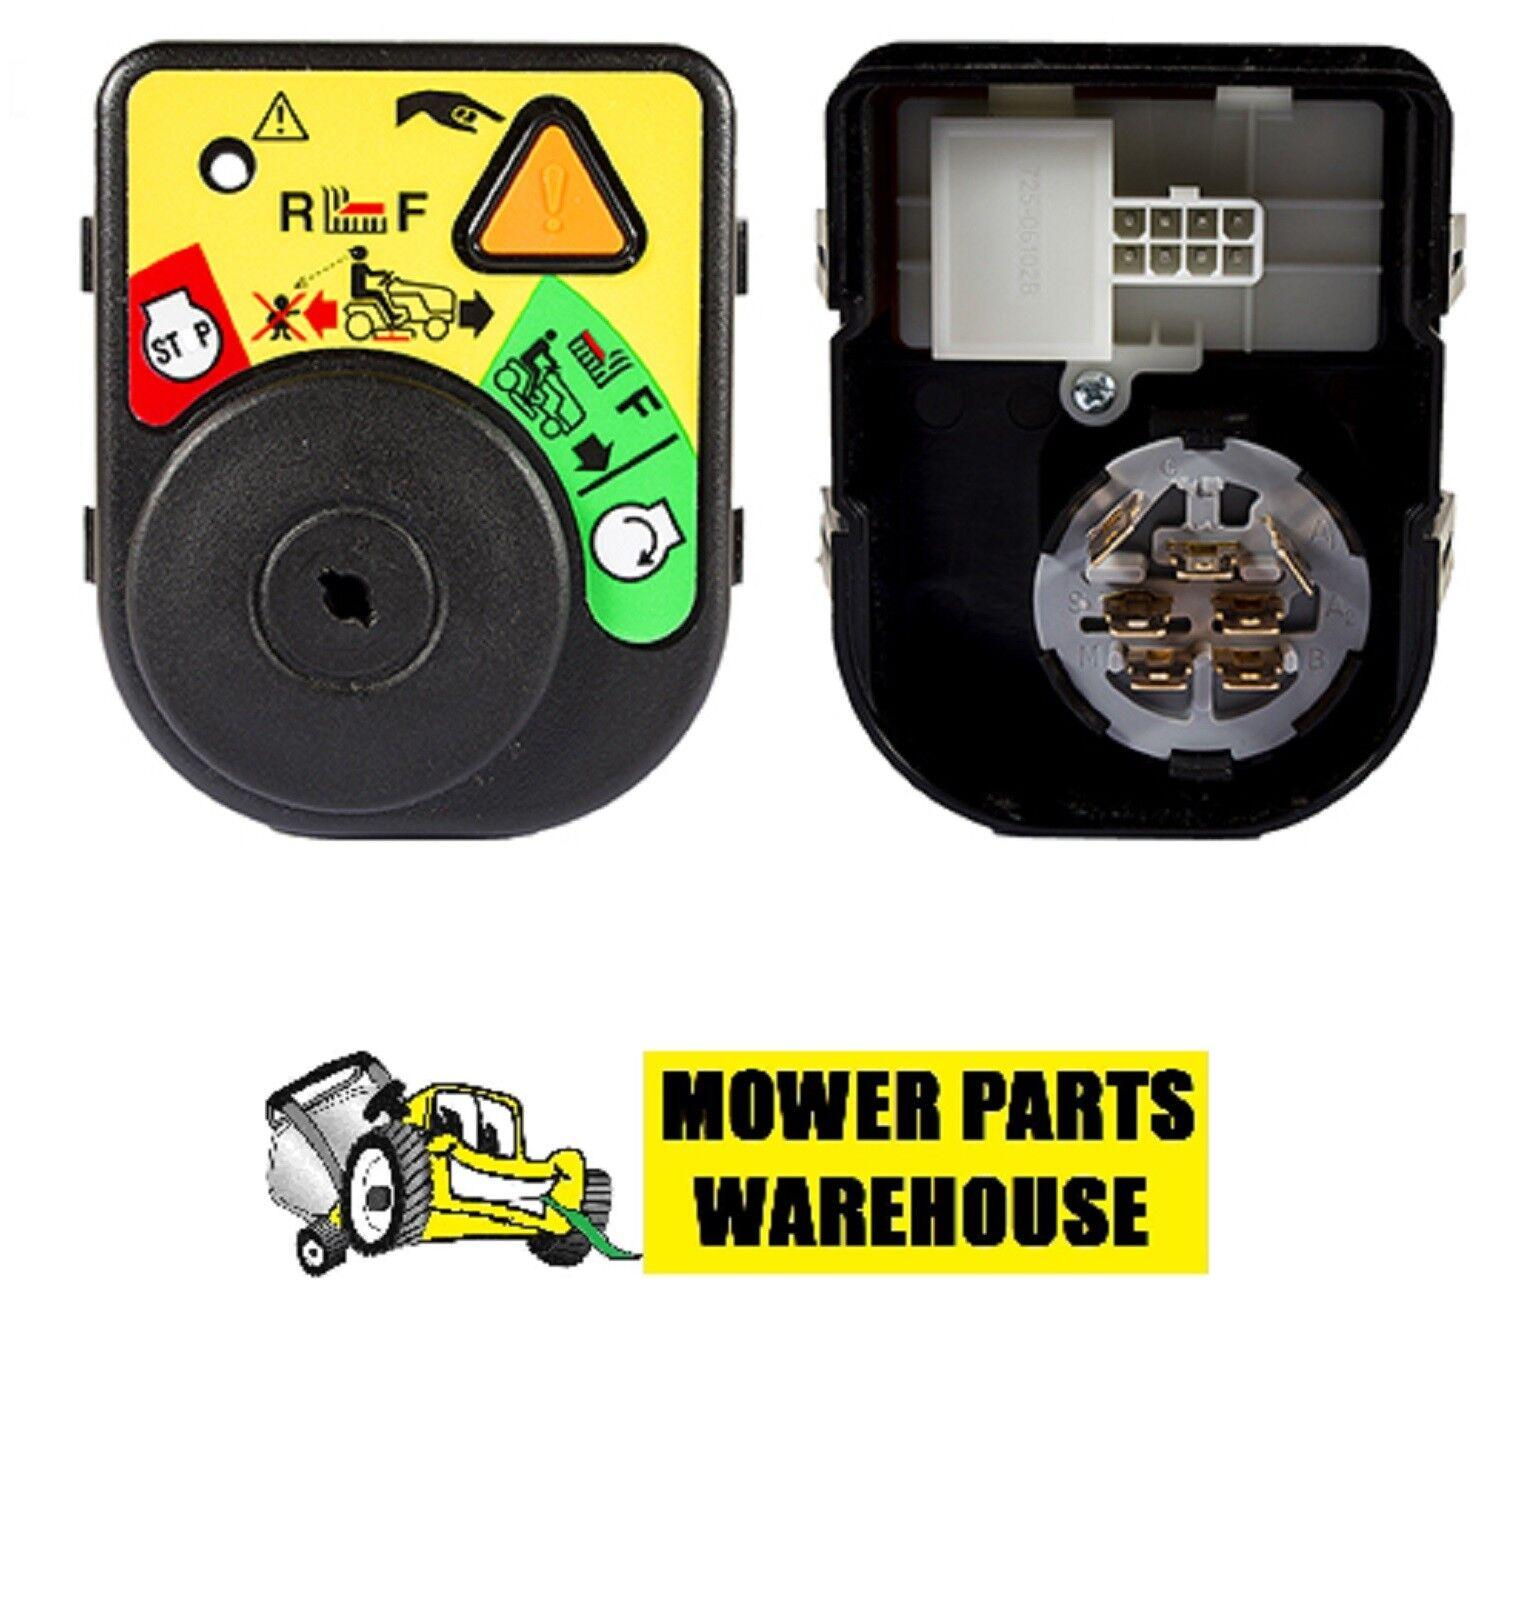 Starter Switch /& Key Kit Fits 925-04227B 725-04227 925-06119A 725-04227B 2030018